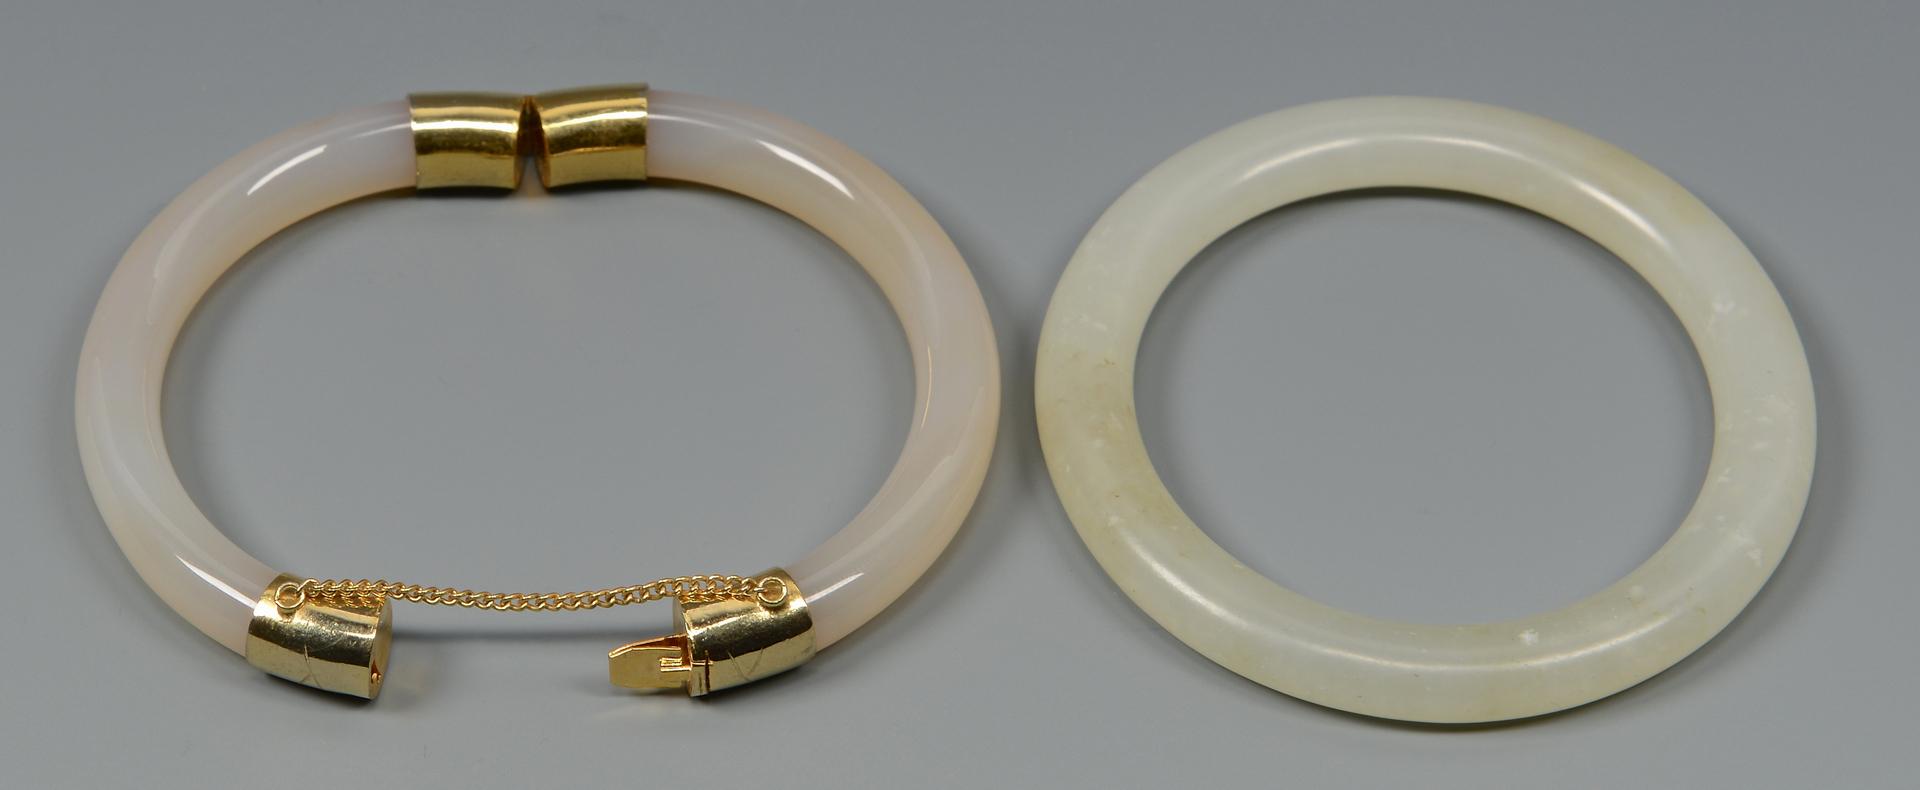 Lot 575: Pair White Jade Bangle Bracelets